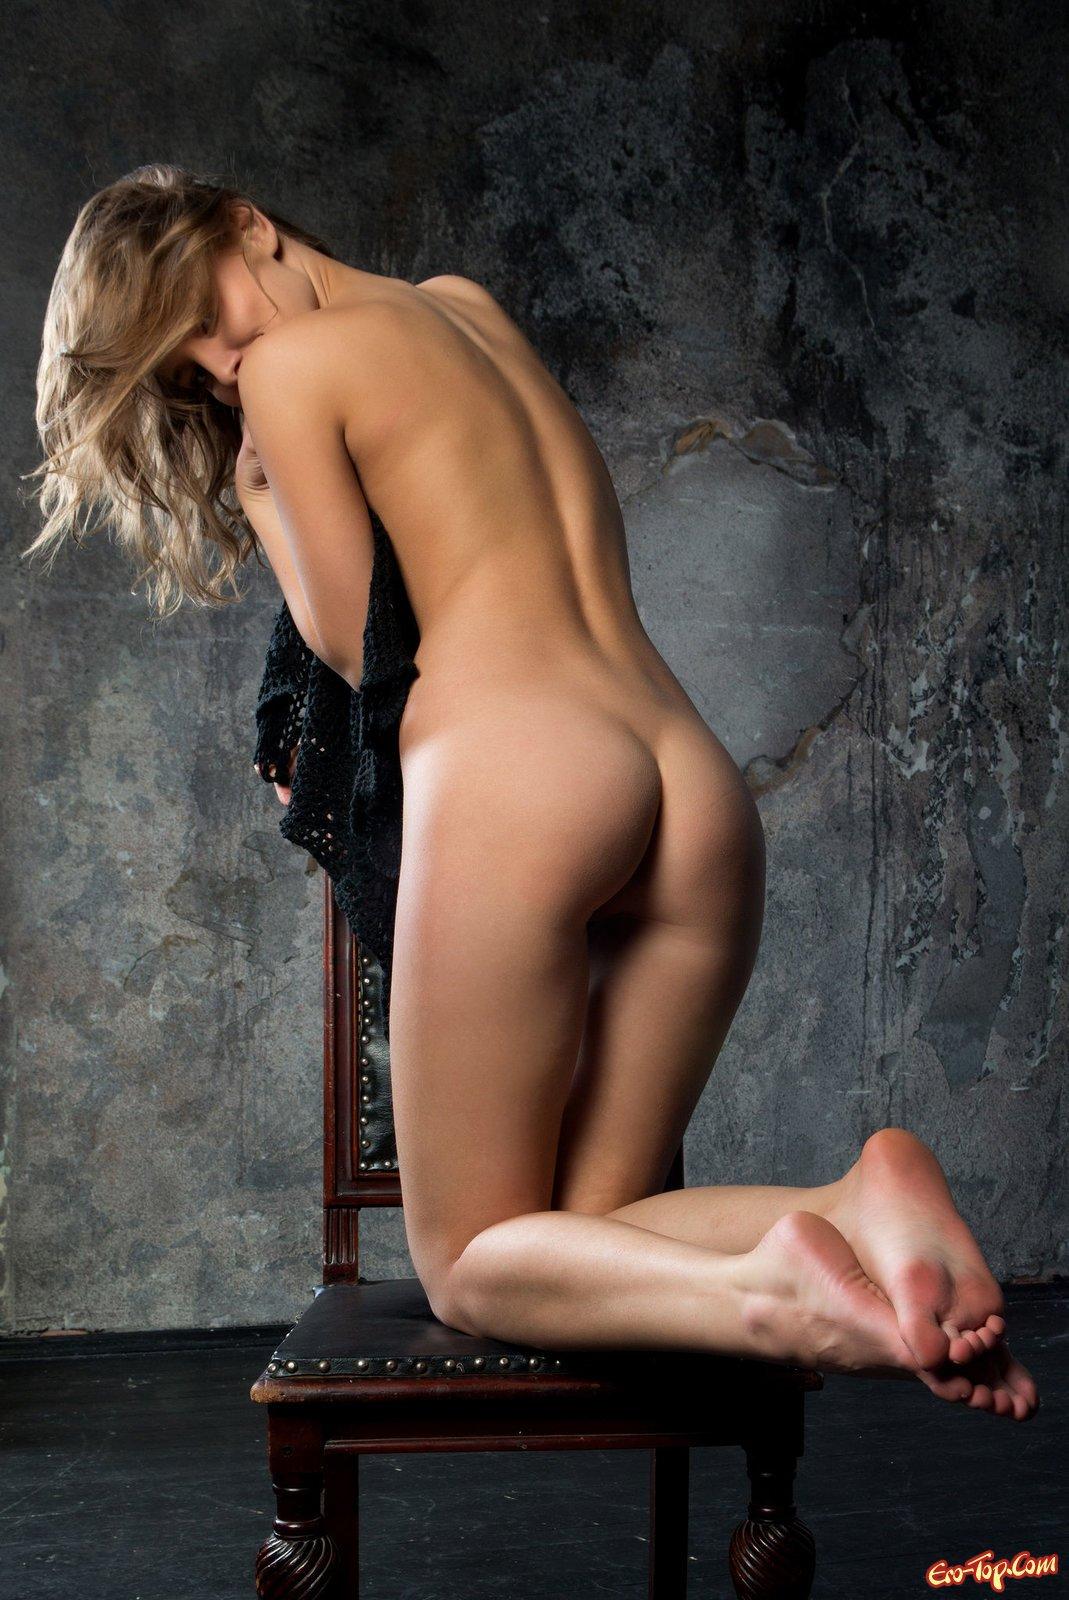 Красотка без лифчика сексуально фоткается на стуле